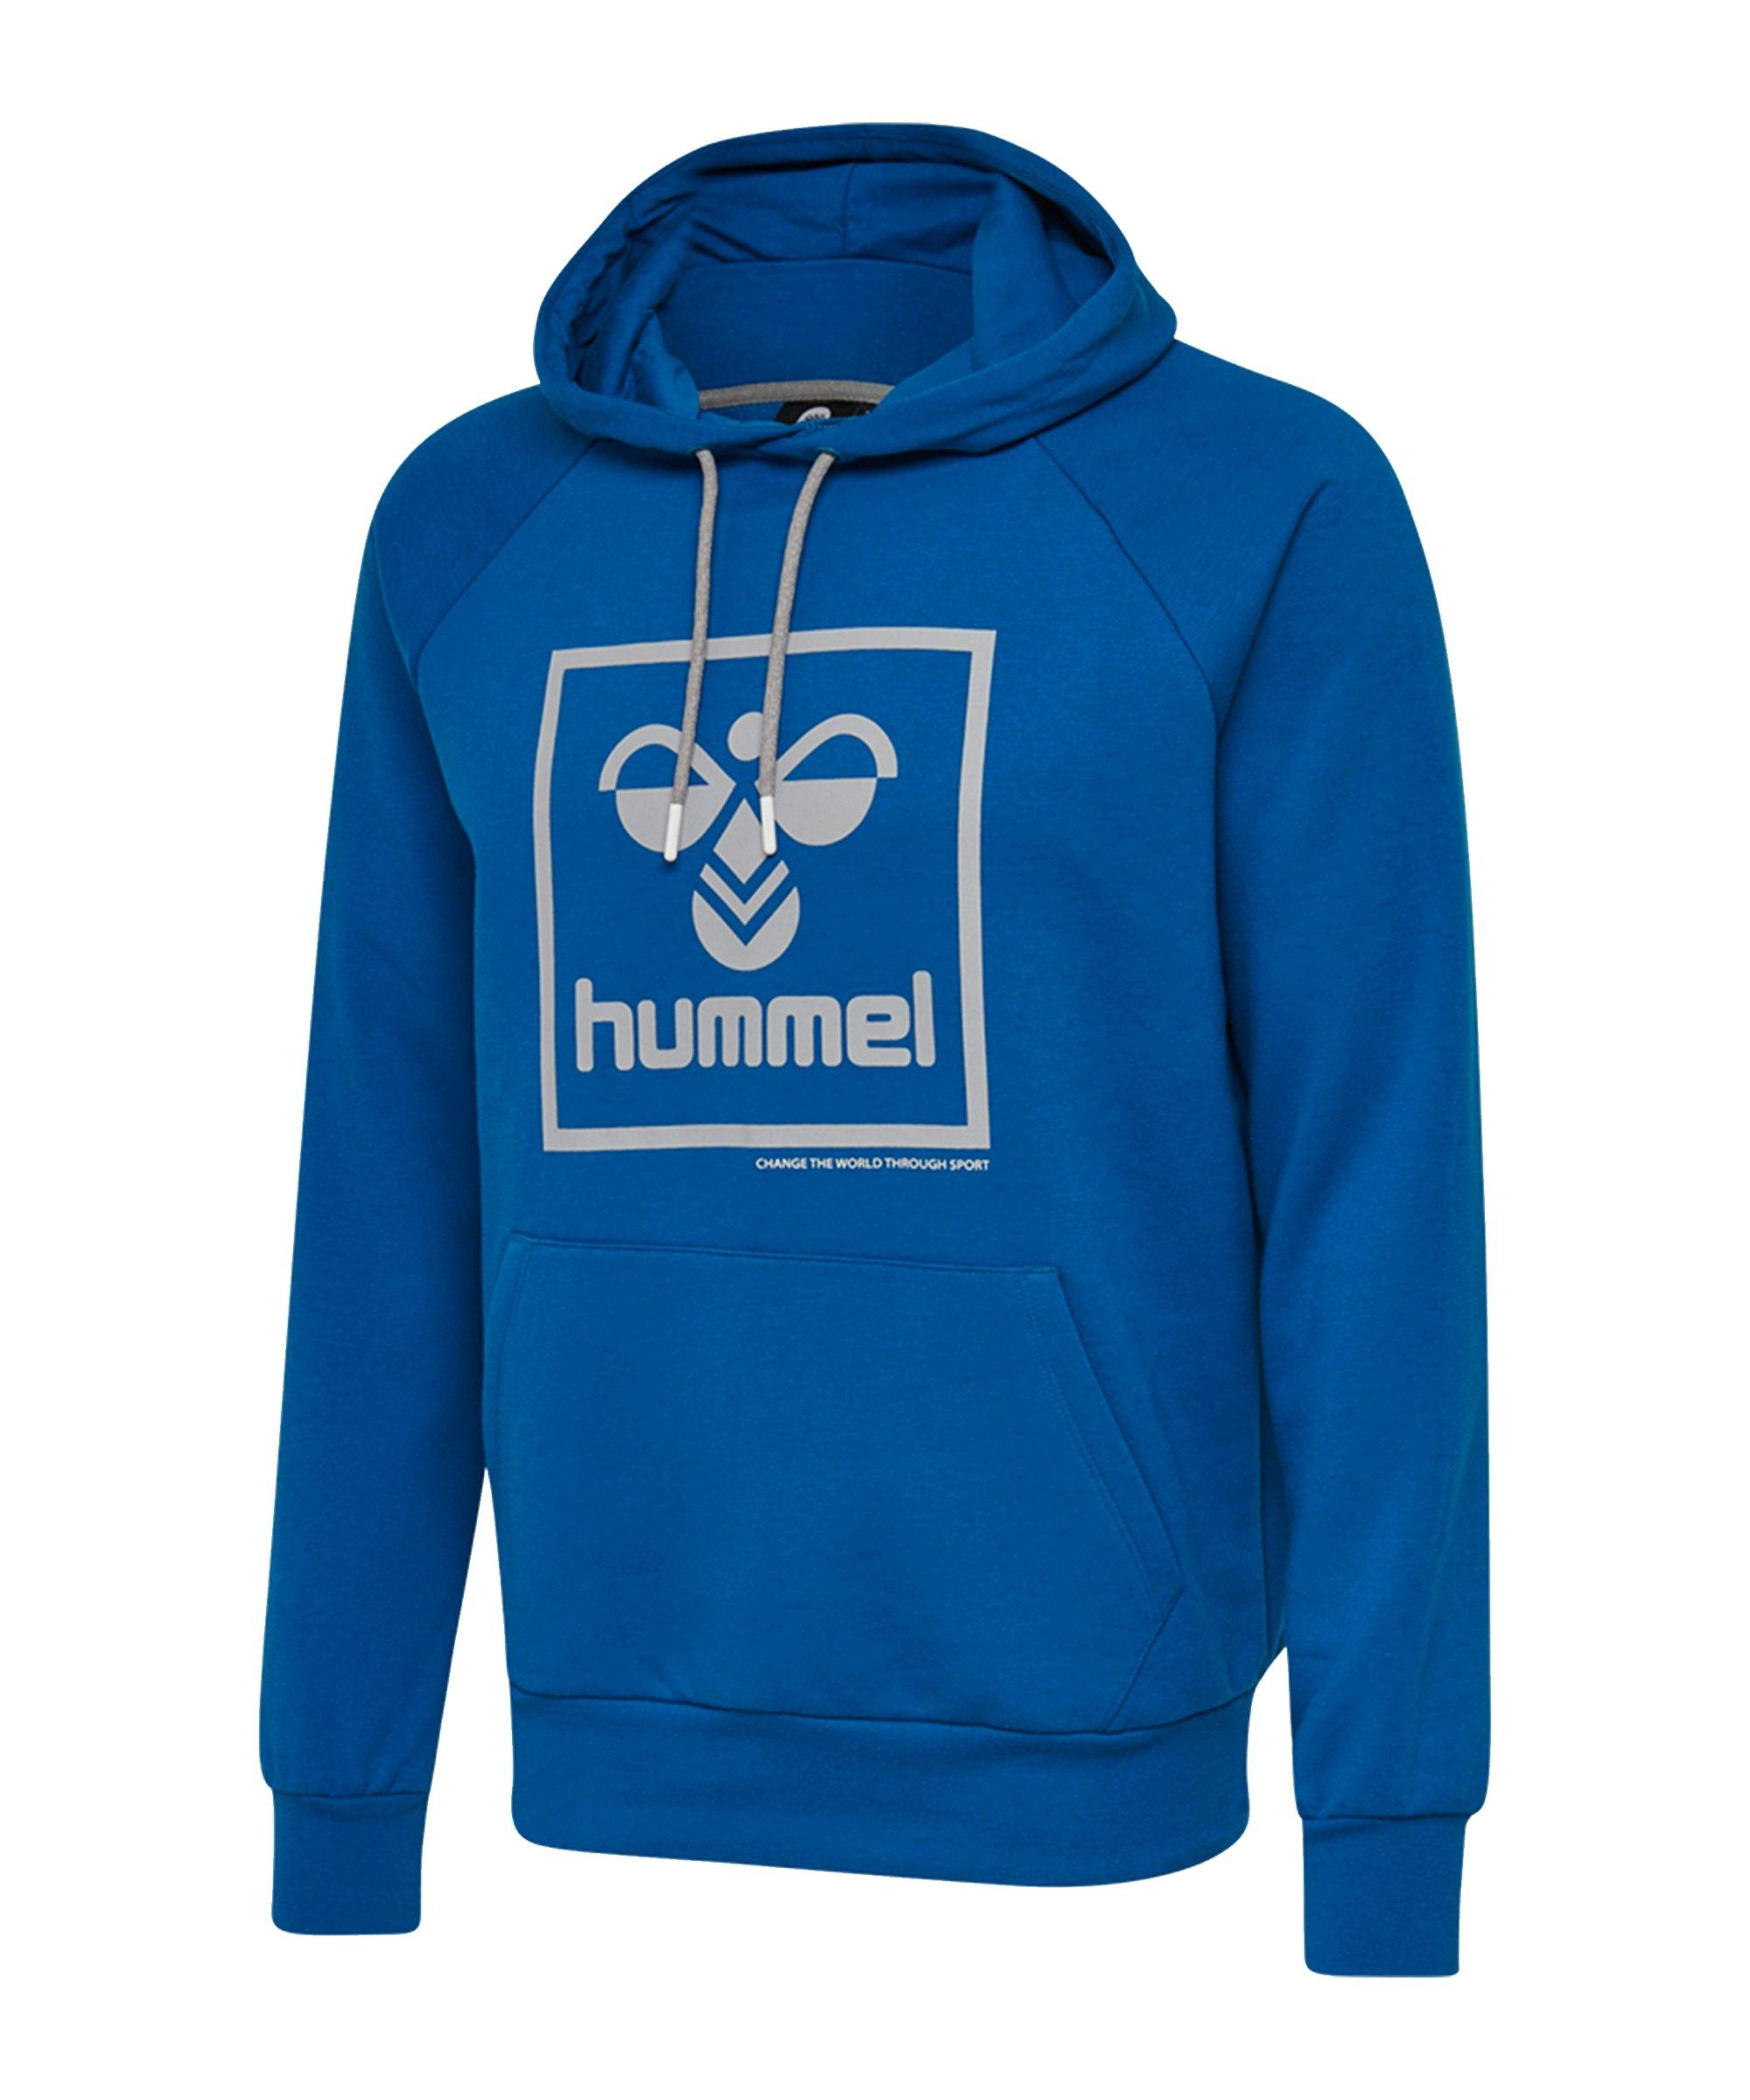 Hummel Isam Hoody Blau F8370 - blau